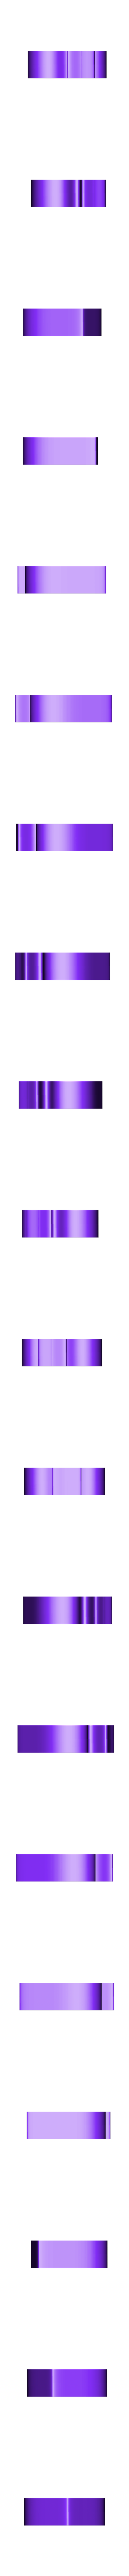 Spade.stl Download free STL file Cards Cookie Cutters (4 Pack) • 3D print design, Jdog